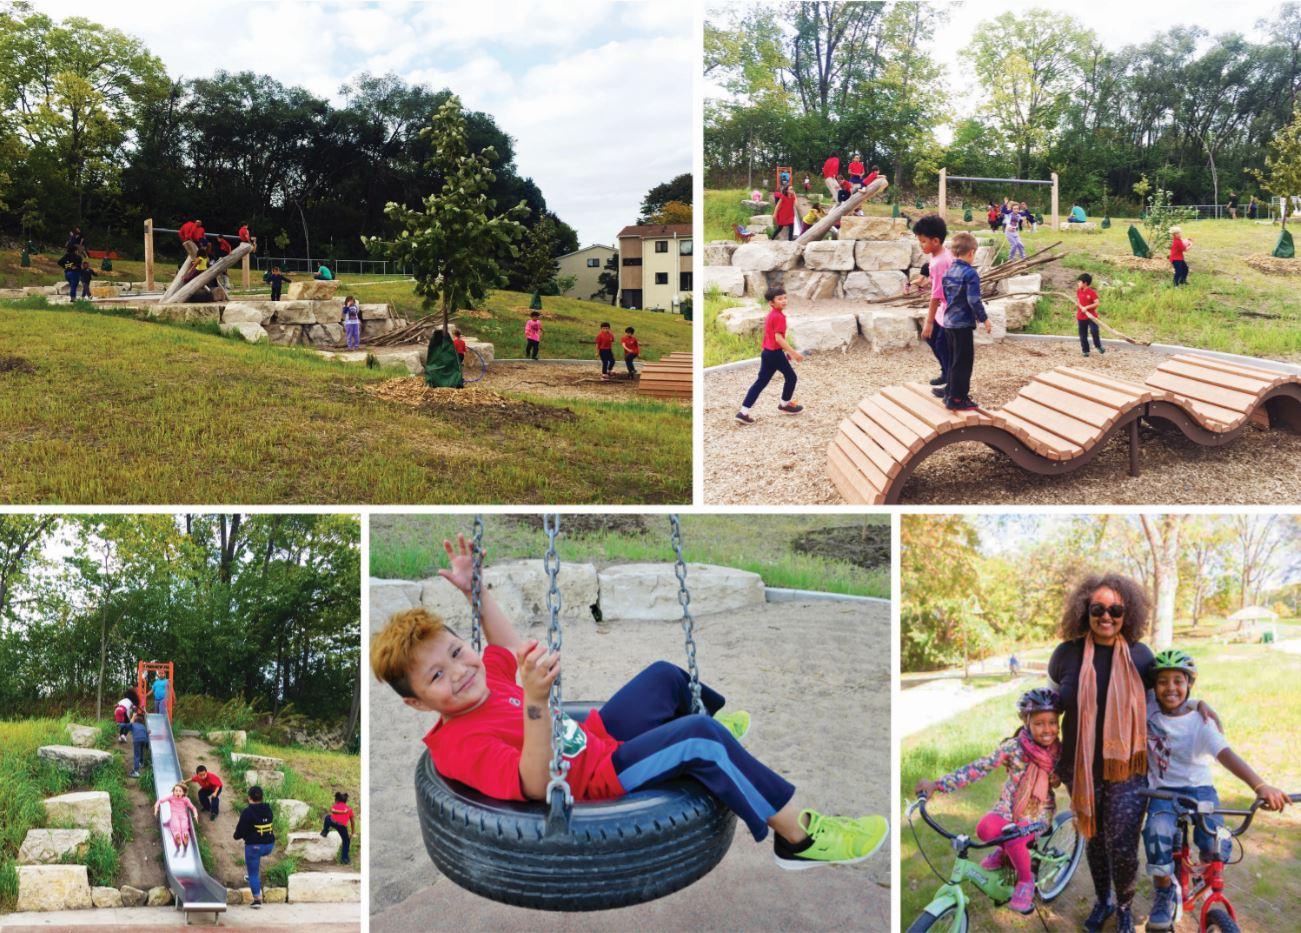 Frogtown Park and Farm Play Area